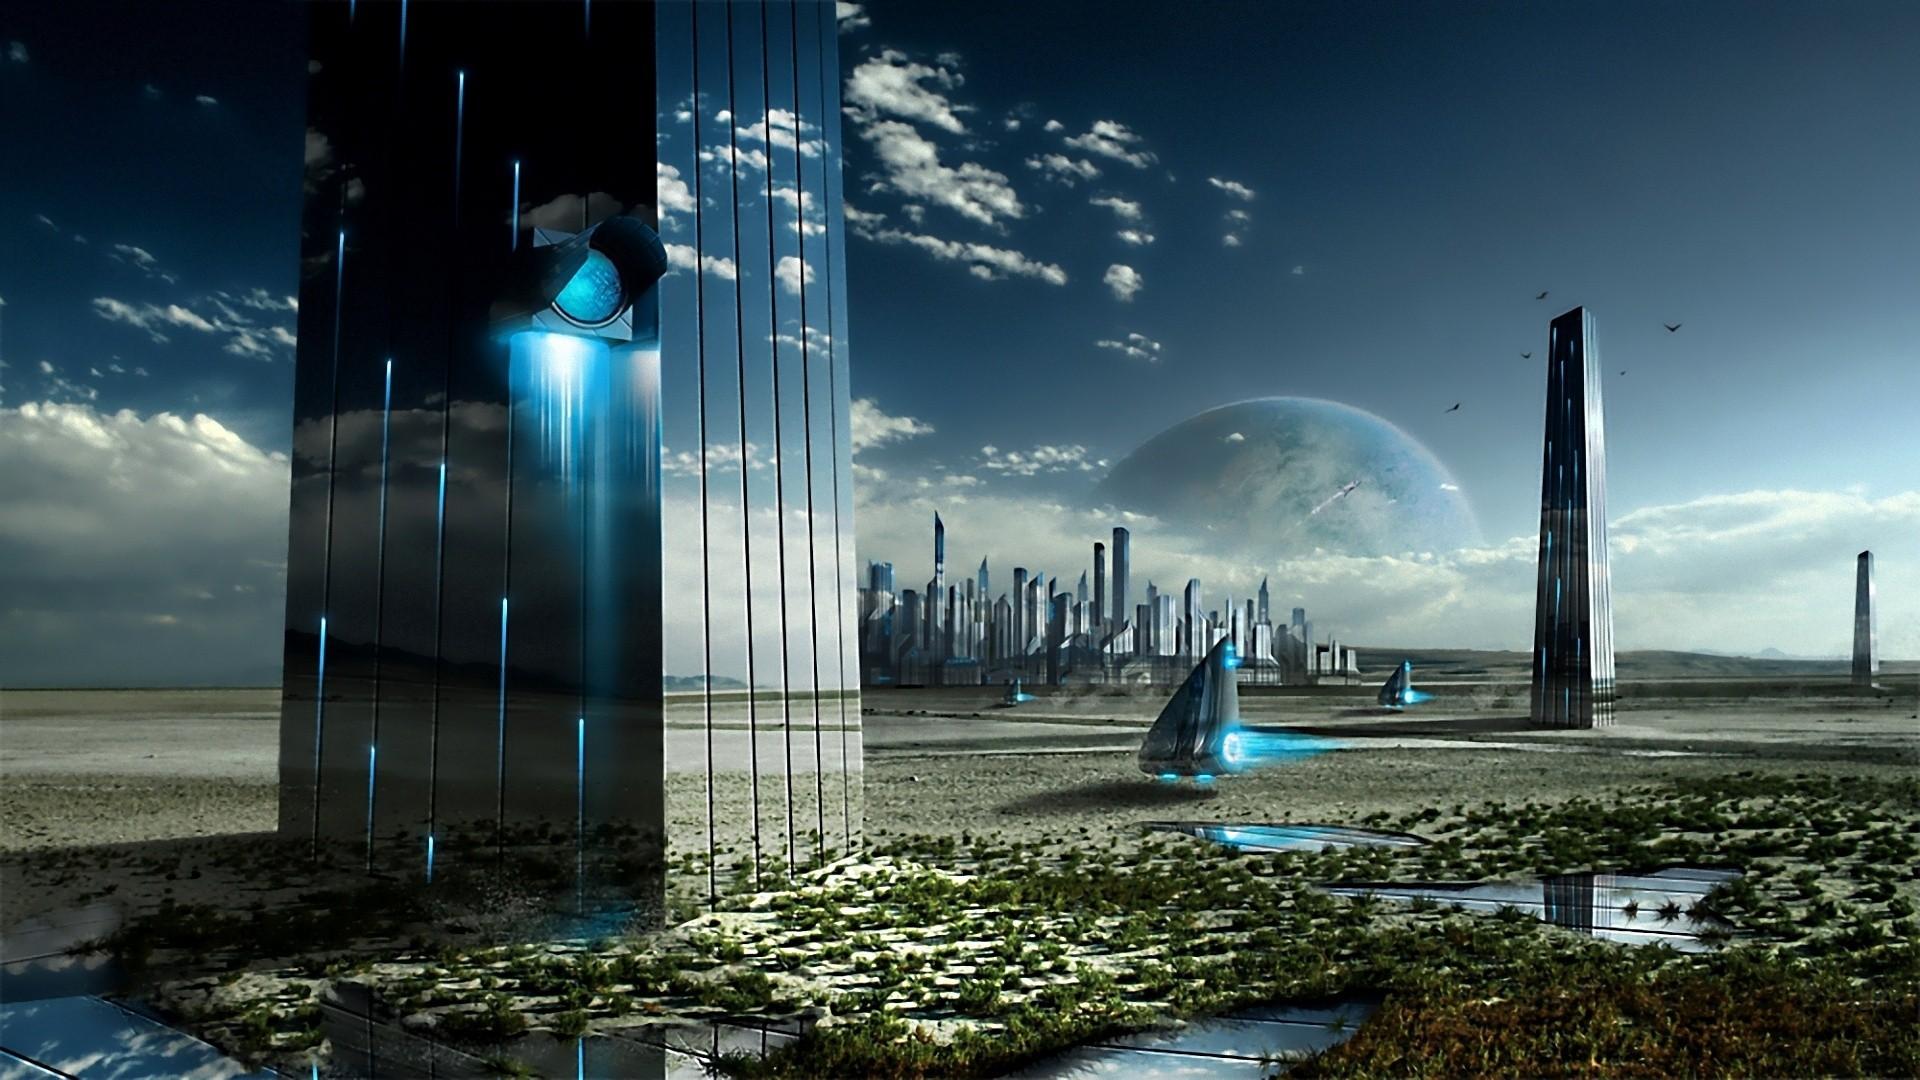 Sci Fi Backgrounds, Compatible - PC, Mobile, Gadgets  1920x1080 px